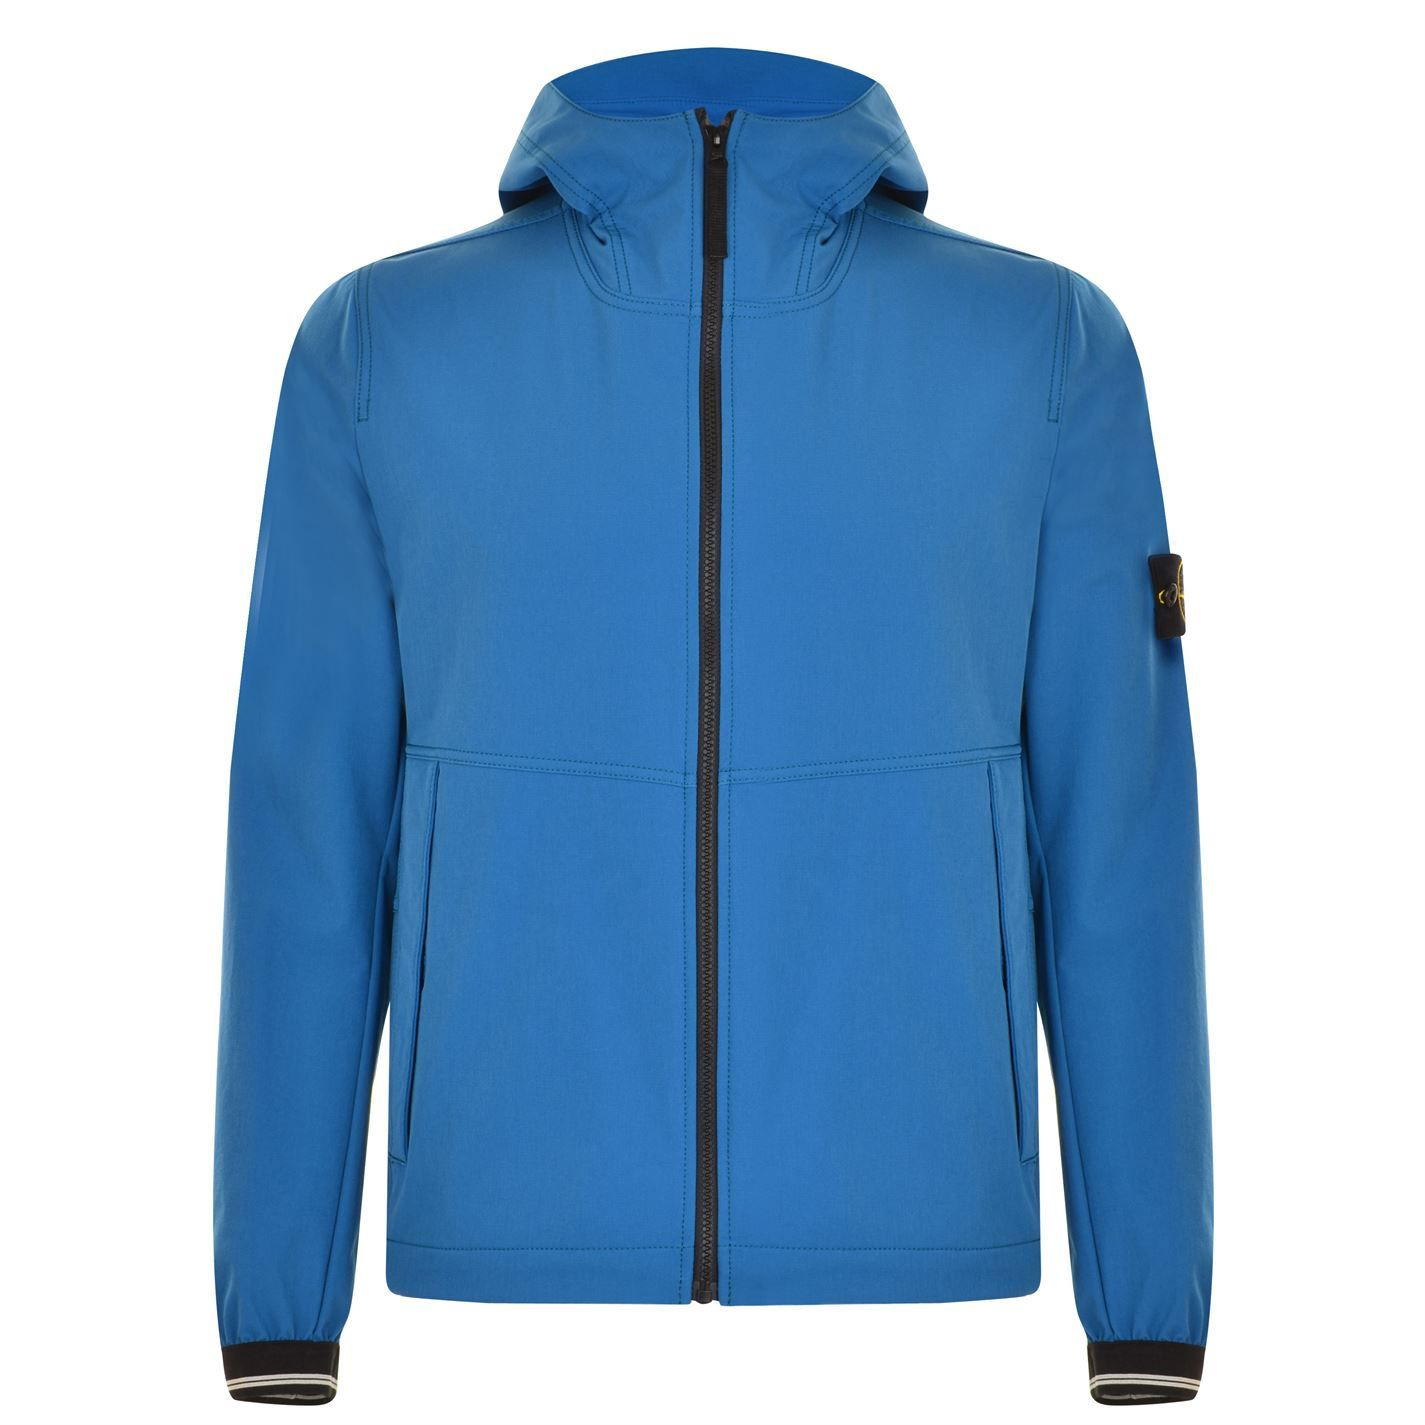 100% authentic 9ff41 e9d0e Stone Island | Comfort Shell Jacket | Threads | Stone island ...